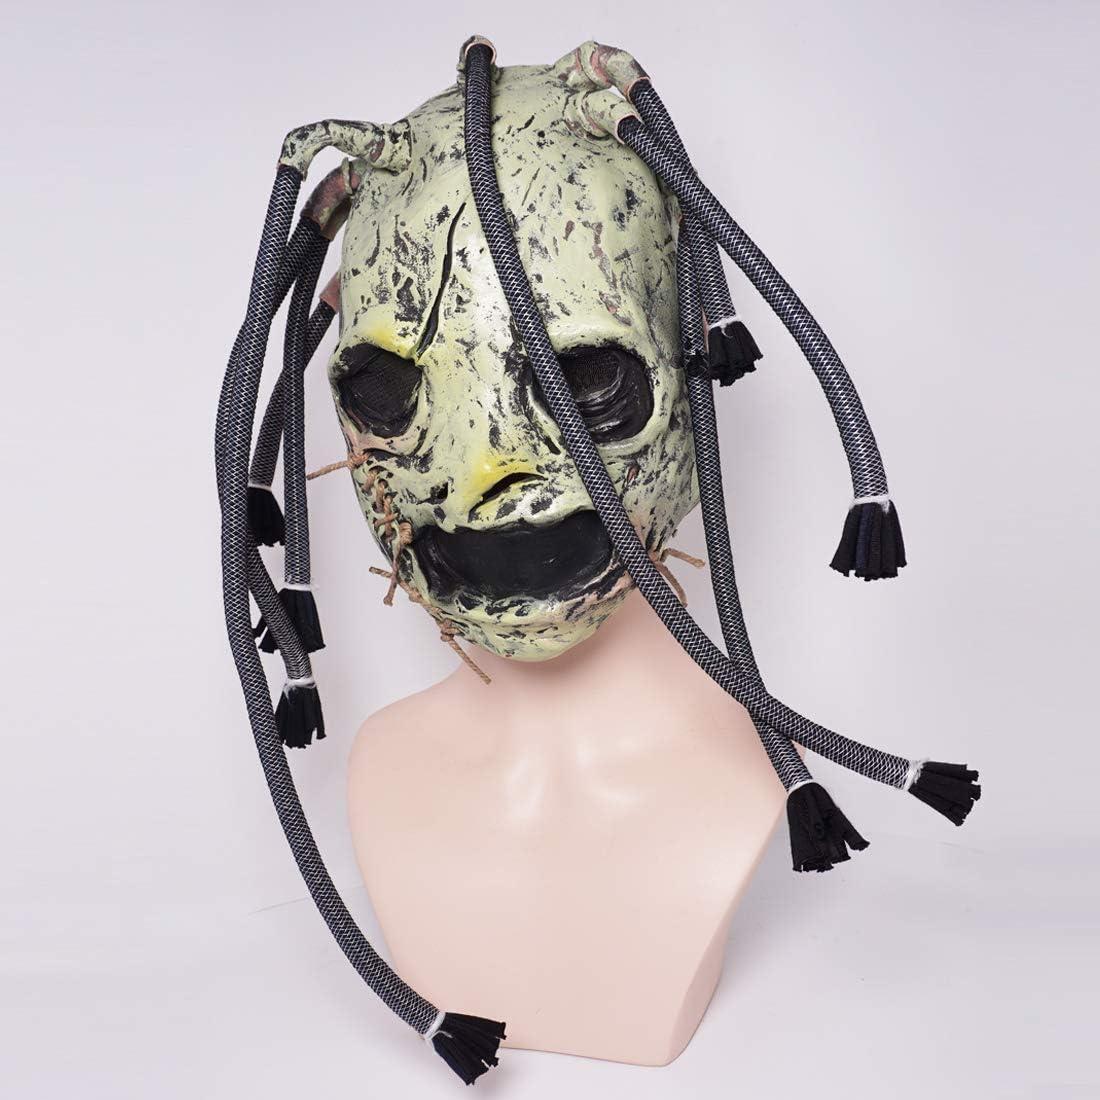 2019 Corey Taylor Latex Mask Dreadlocks Slipknot Fancy Dress Halloween Cosplay Music Party Prop